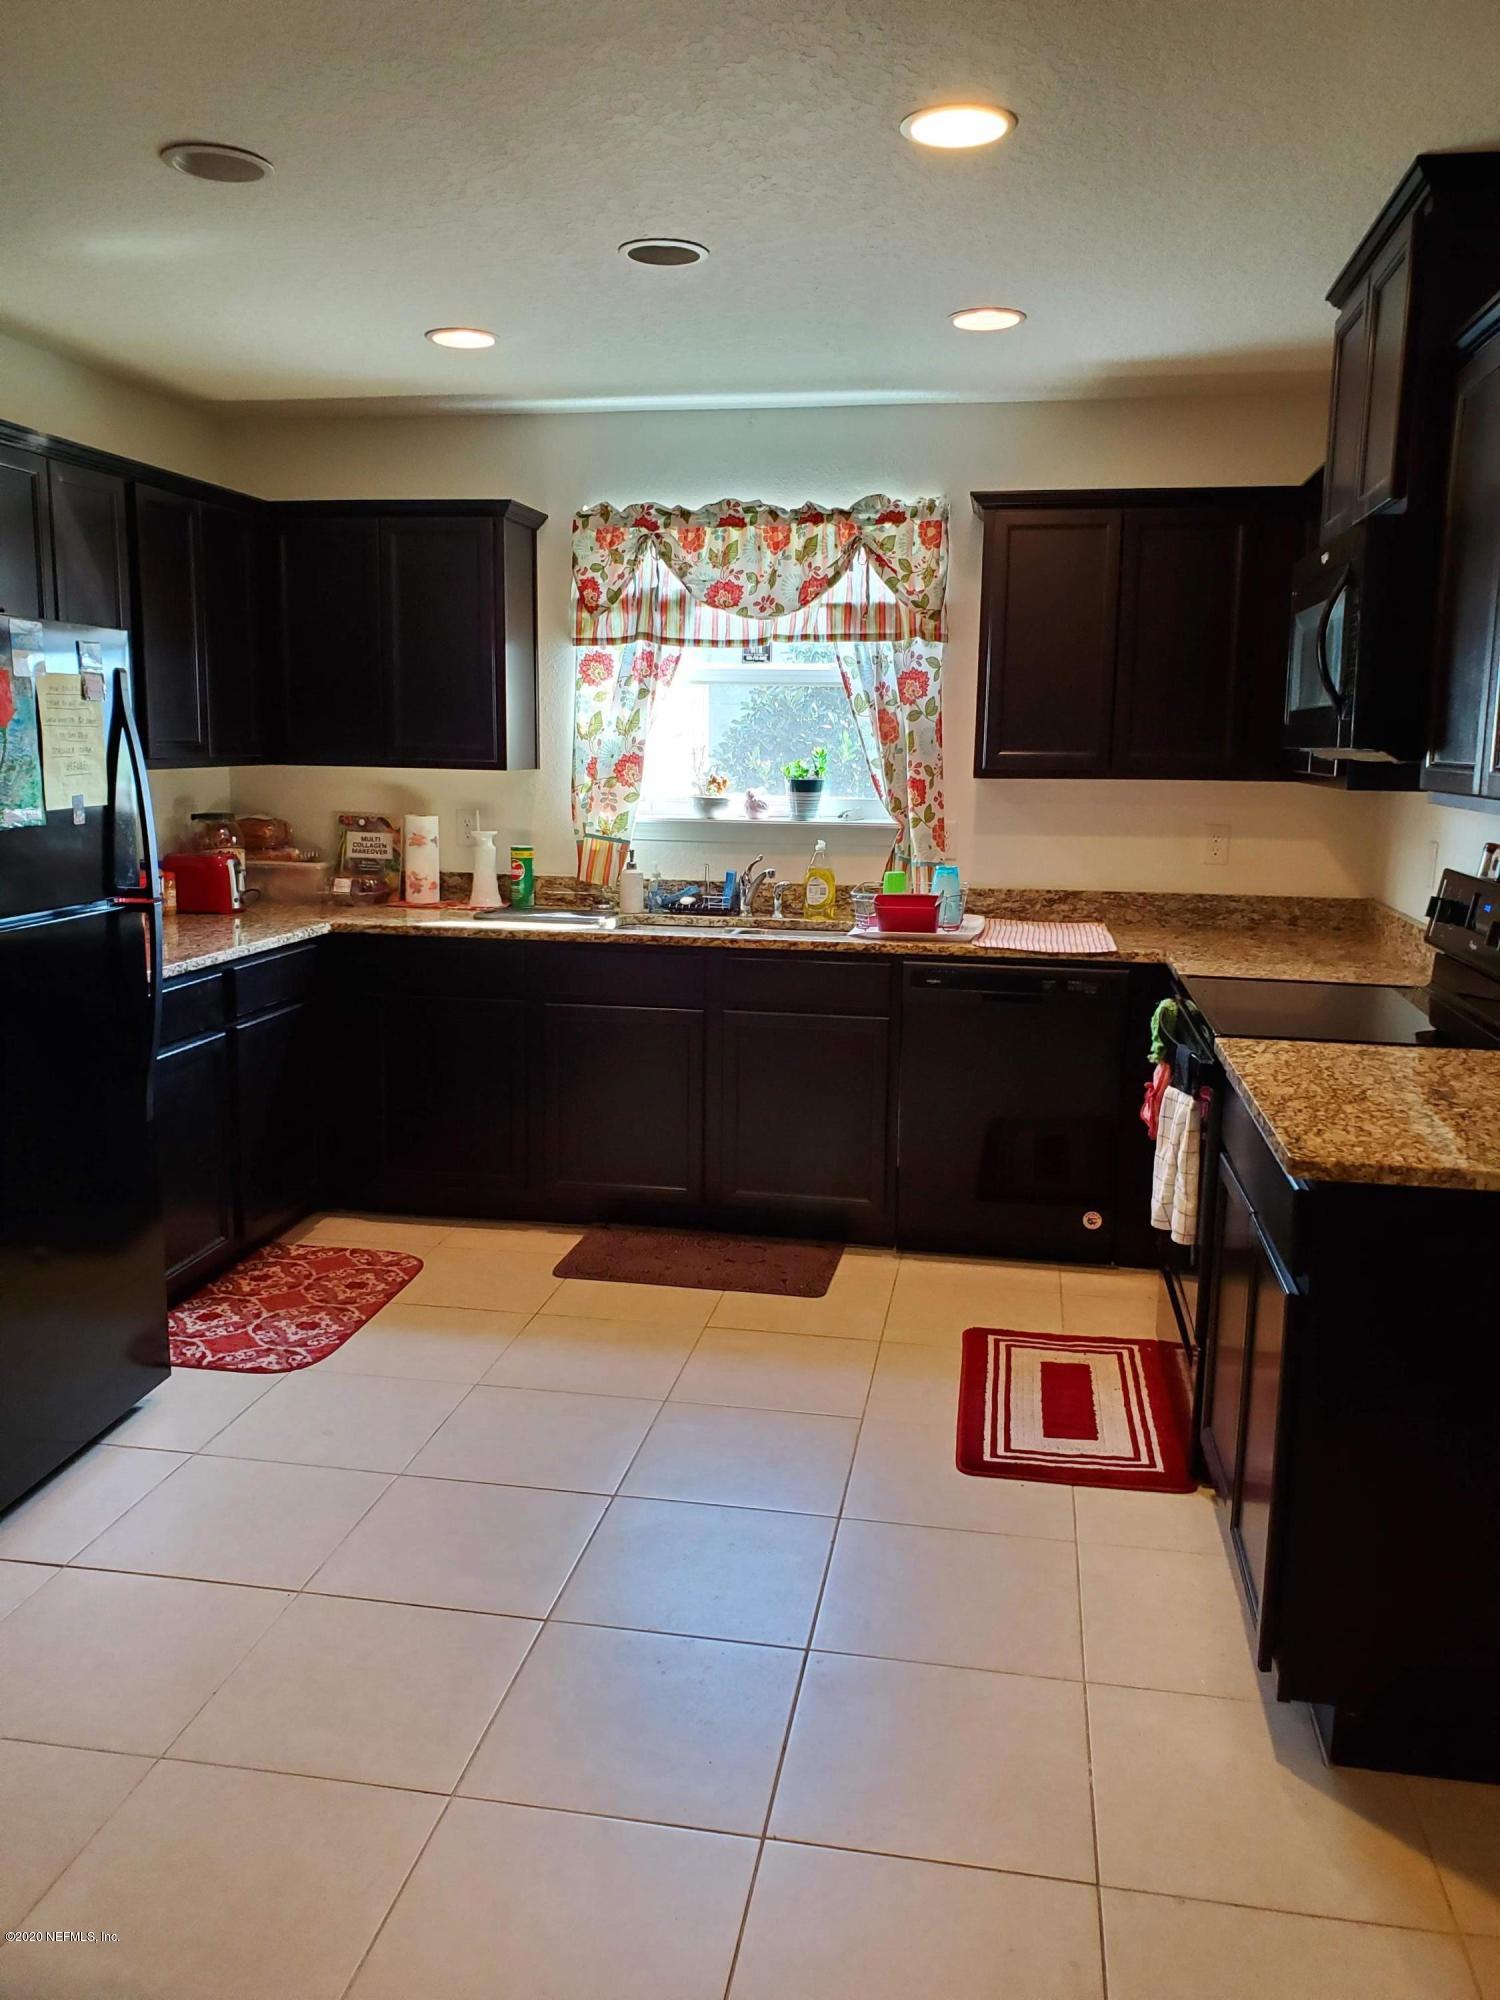 3221 HIDDEN MEADOWS, GREEN COVE SPRINGS, FLORIDA 32043, 3 Bedrooms Bedrooms, ,2 BathroomsBathrooms,Residential,For sale,HIDDEN MEADOWS,1075177